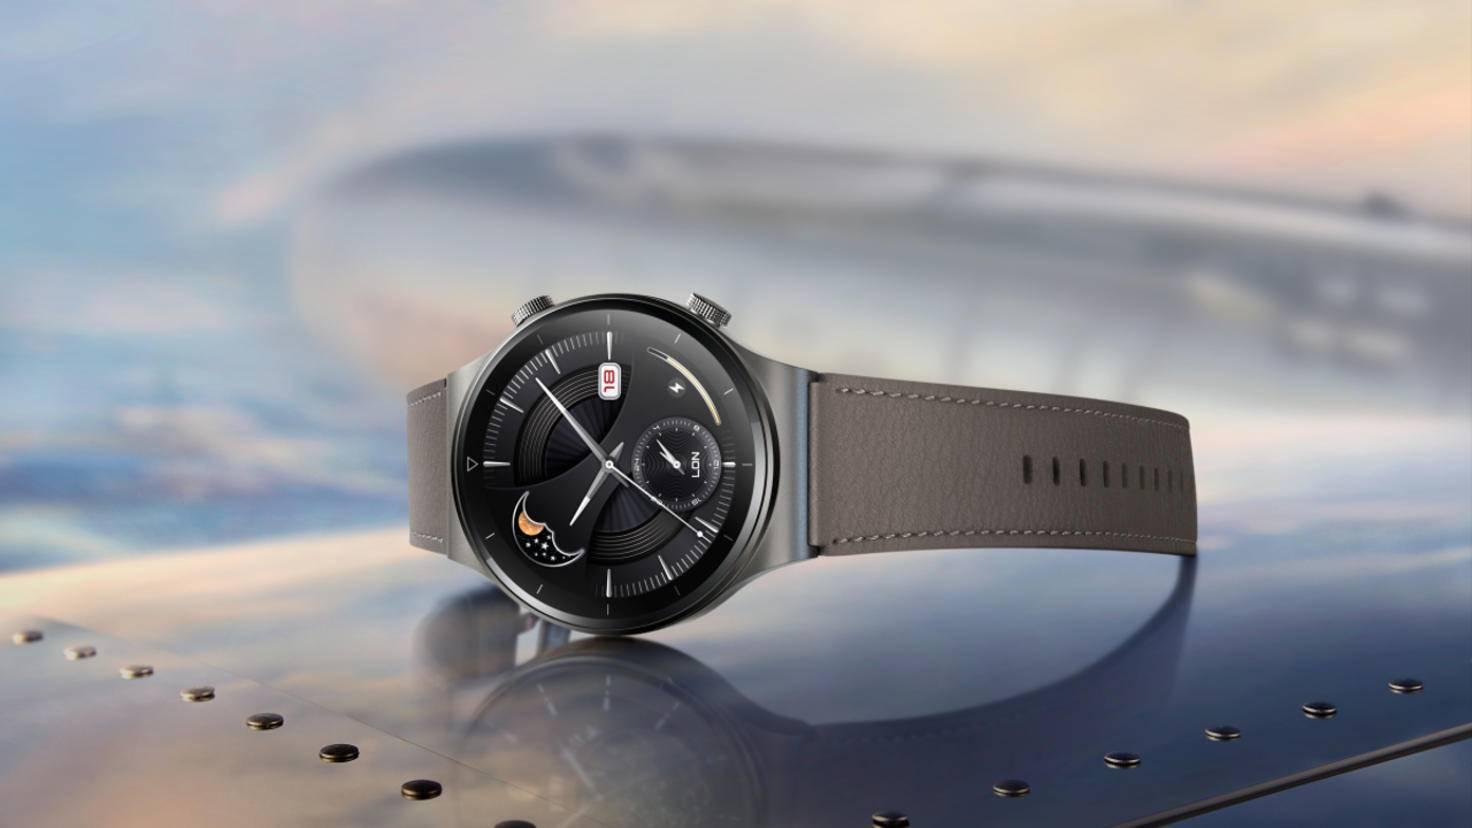 Montre Huawei GT